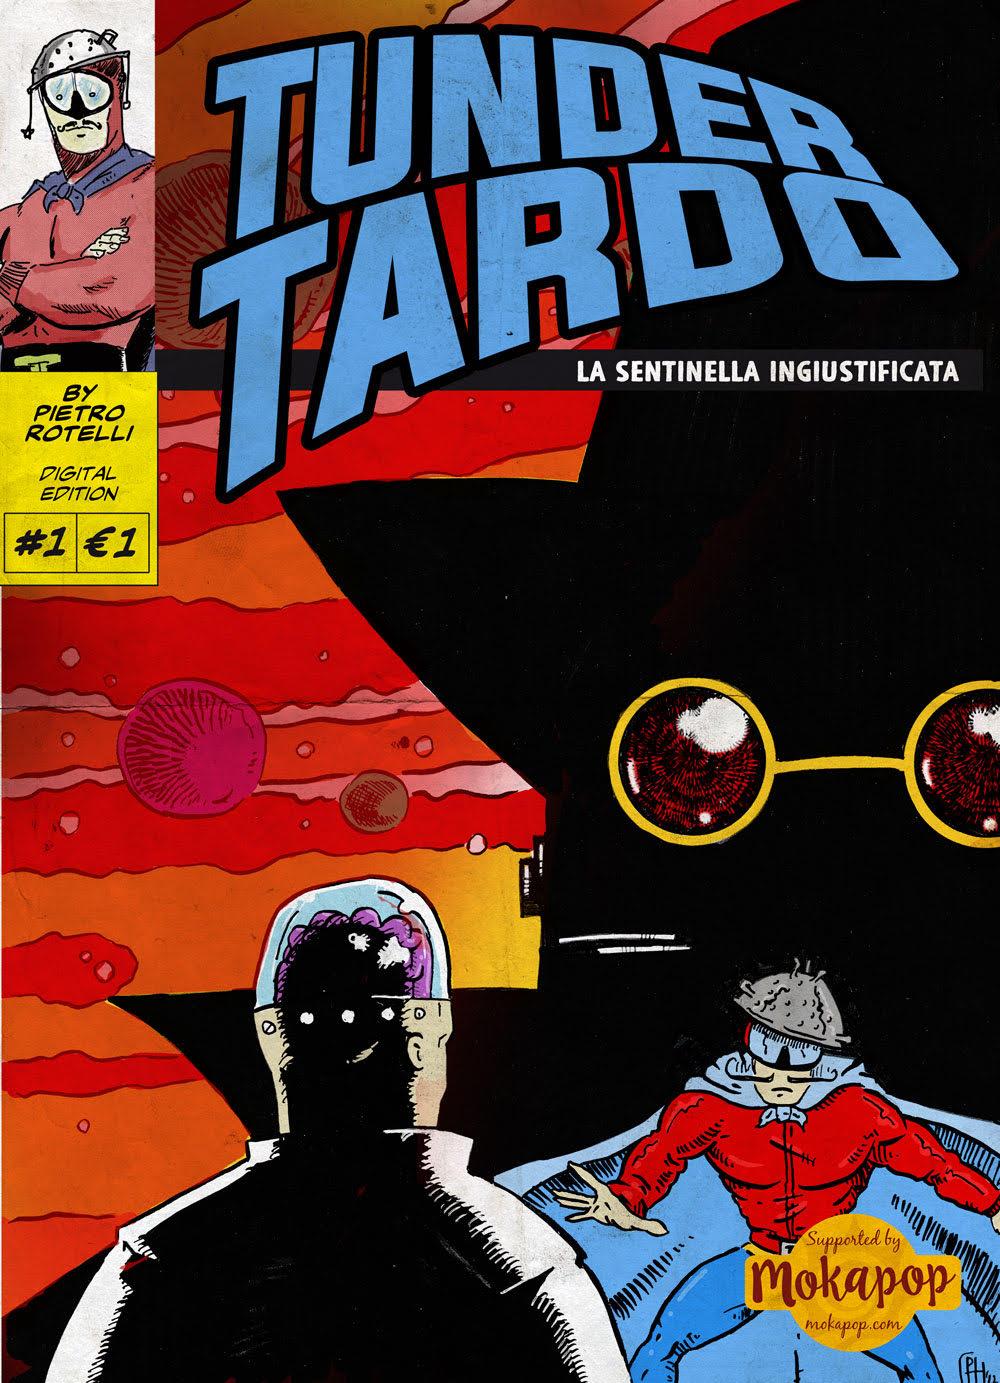 Fumetti: Tunder Tardo debutta all'ARF, supported by Mokapop